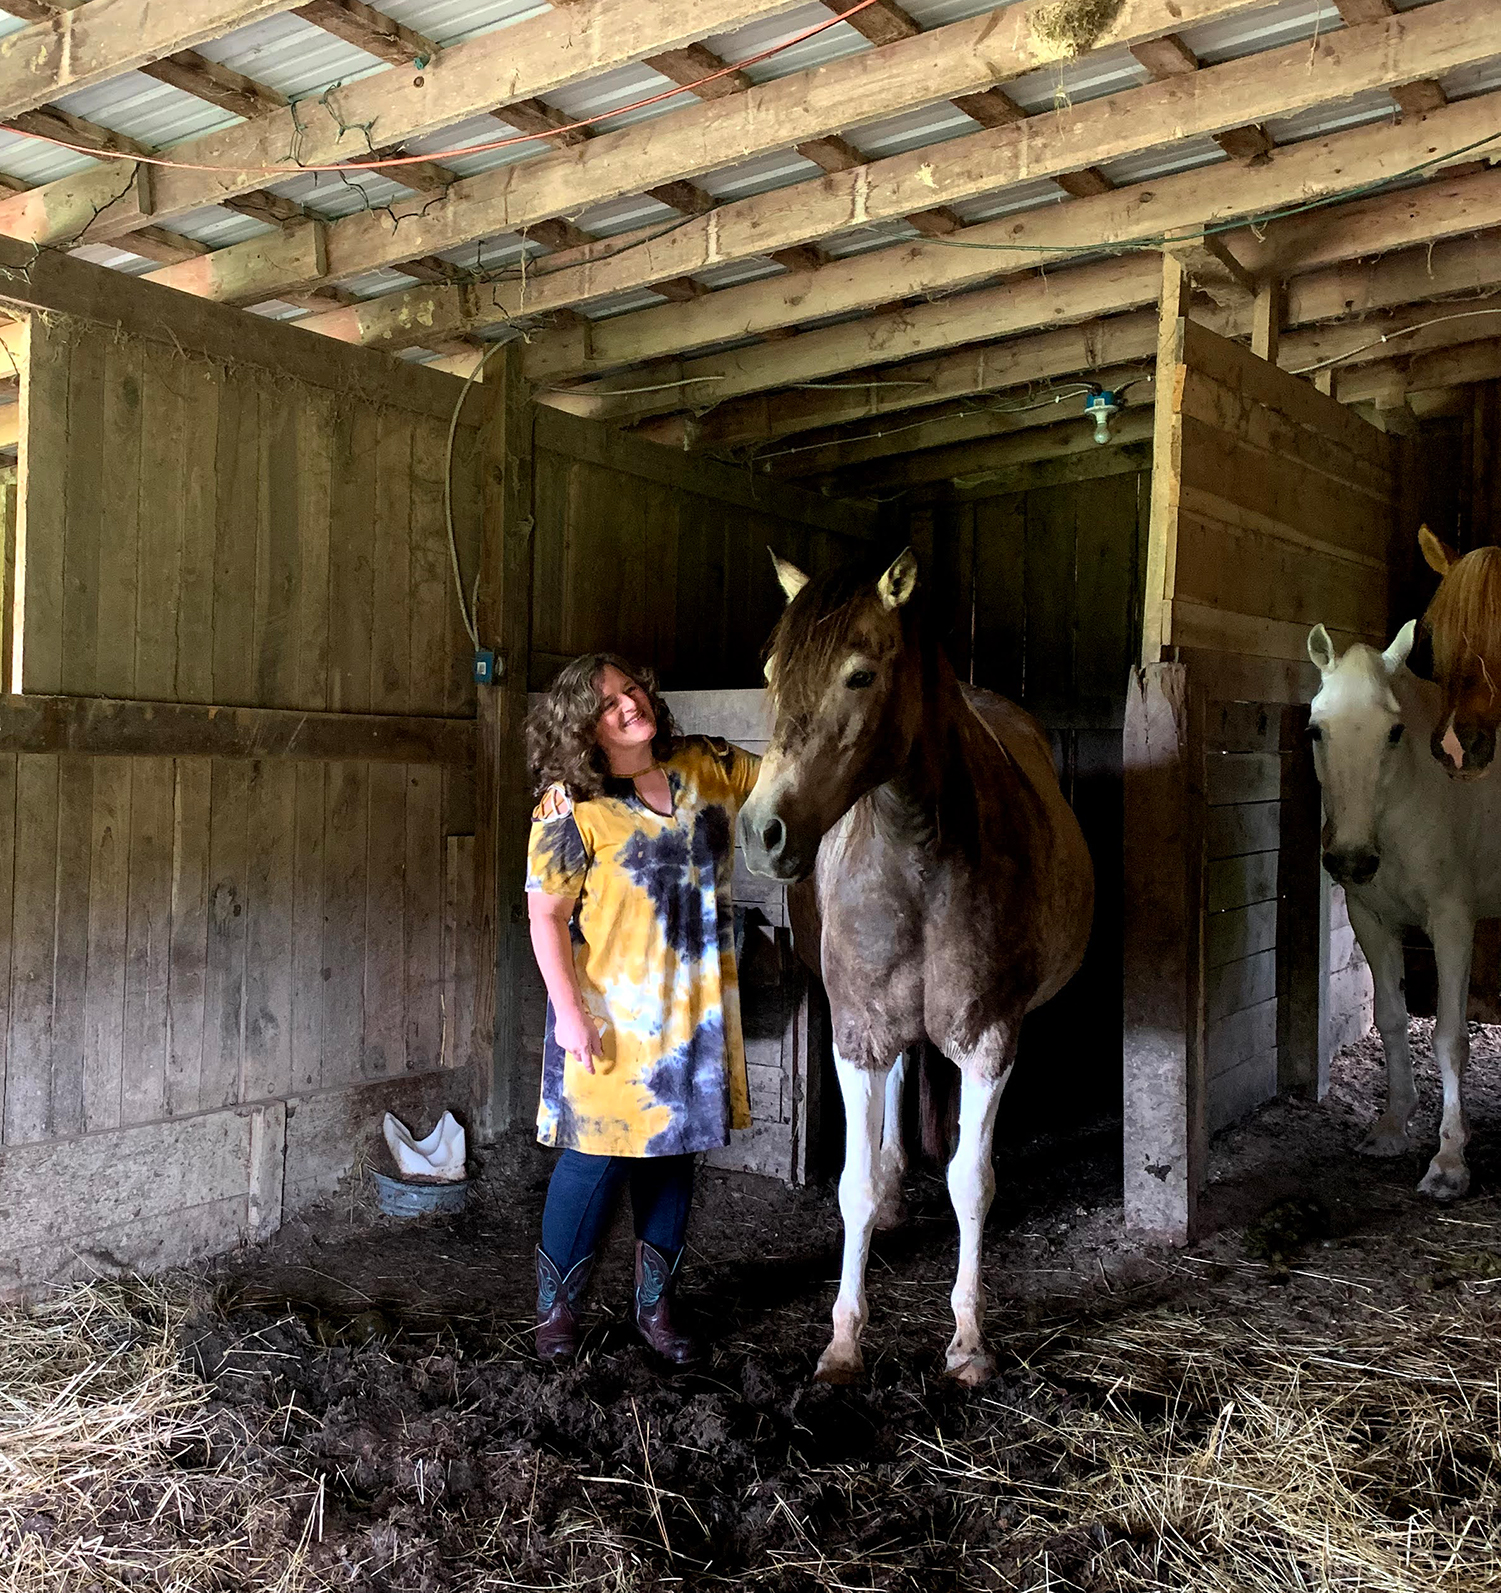 Ohio's Winding Road Stories: Journey With Horses